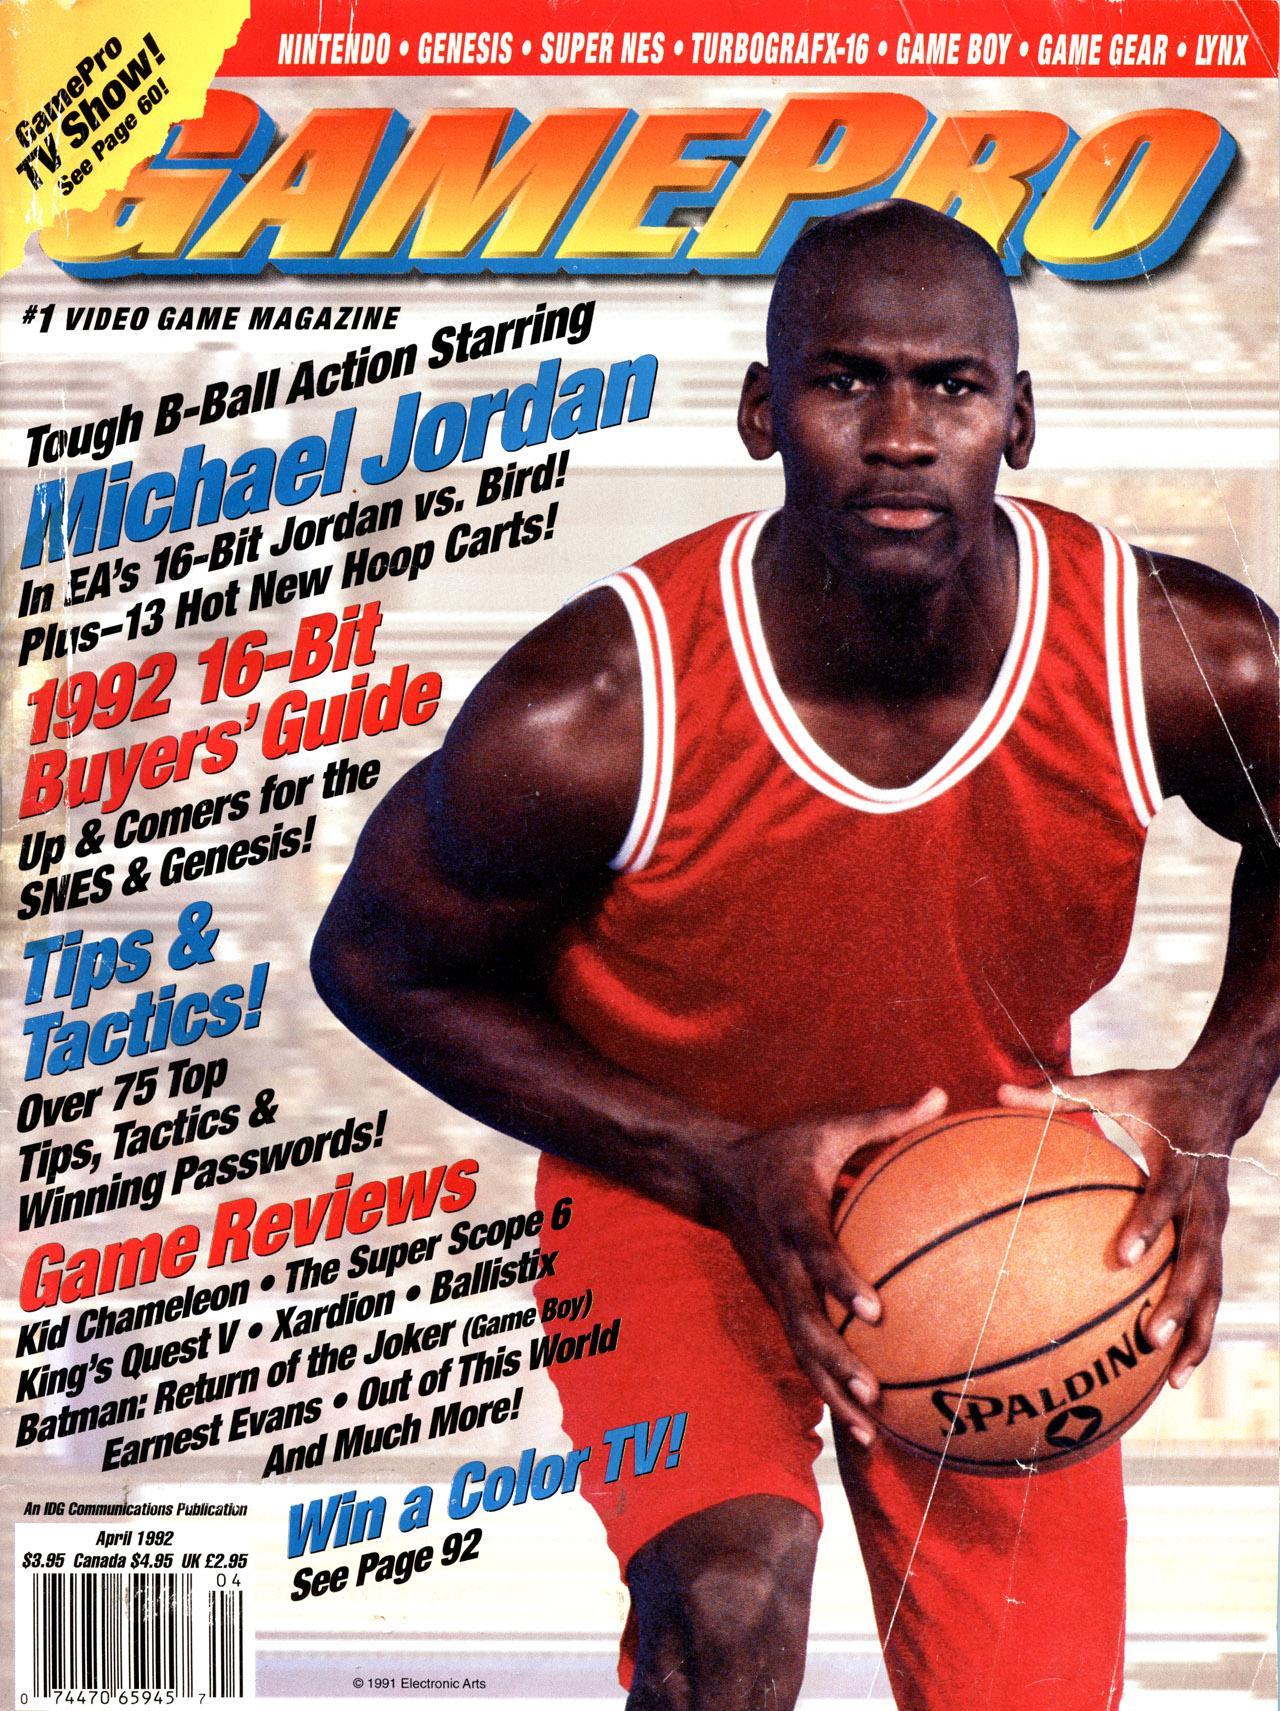 magazine gamepro michael jordan v4 4 of 12 1992 4 page 2